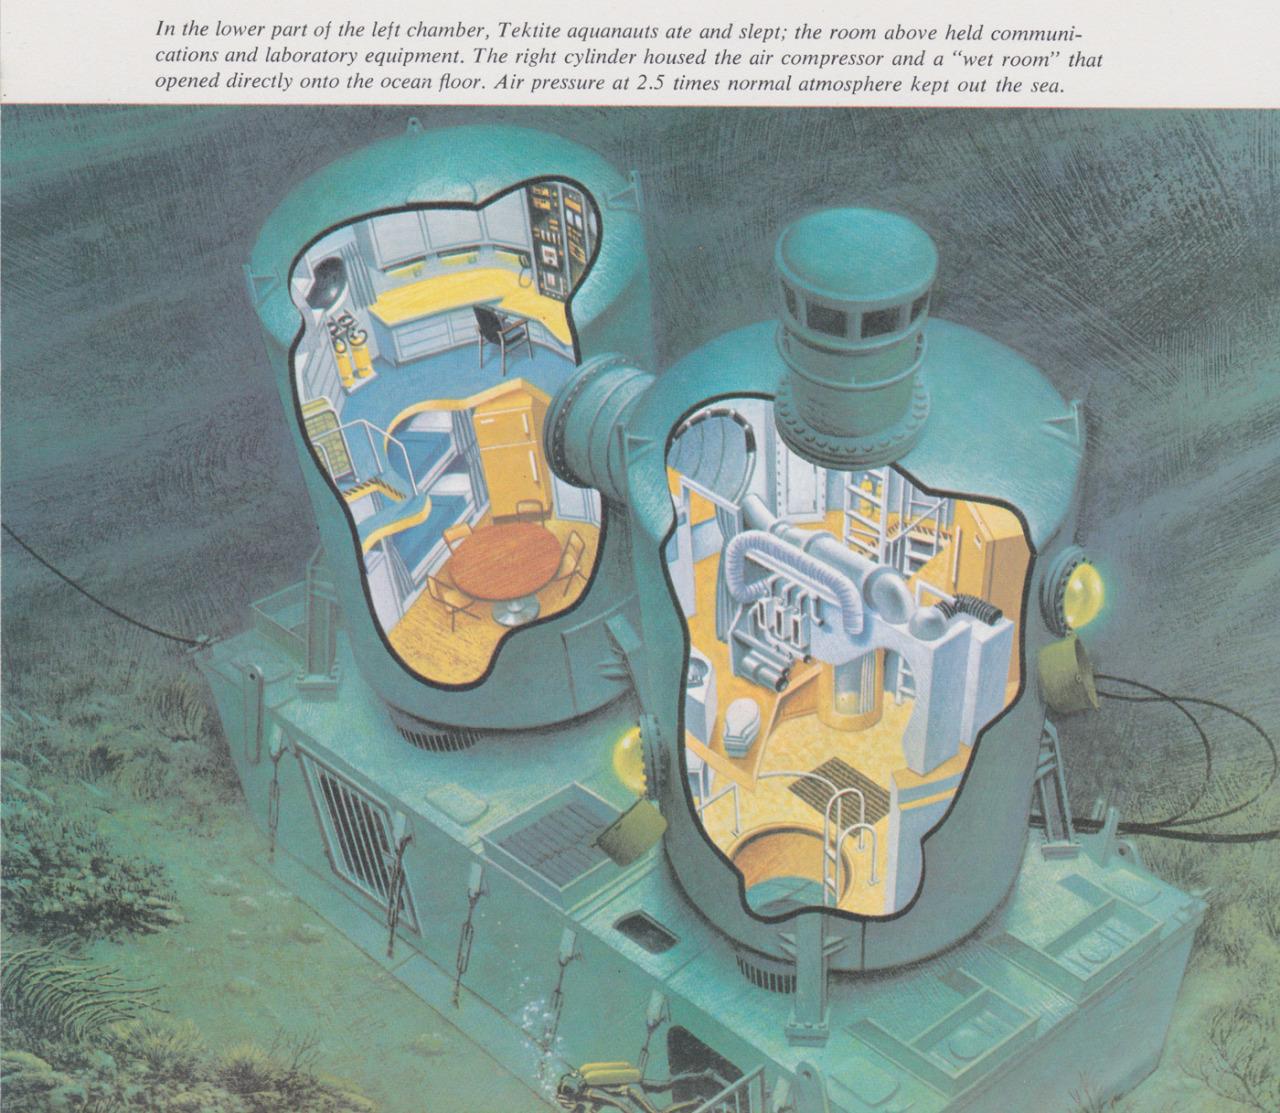 'Tektite', una vivienda acuática - Cutaway World